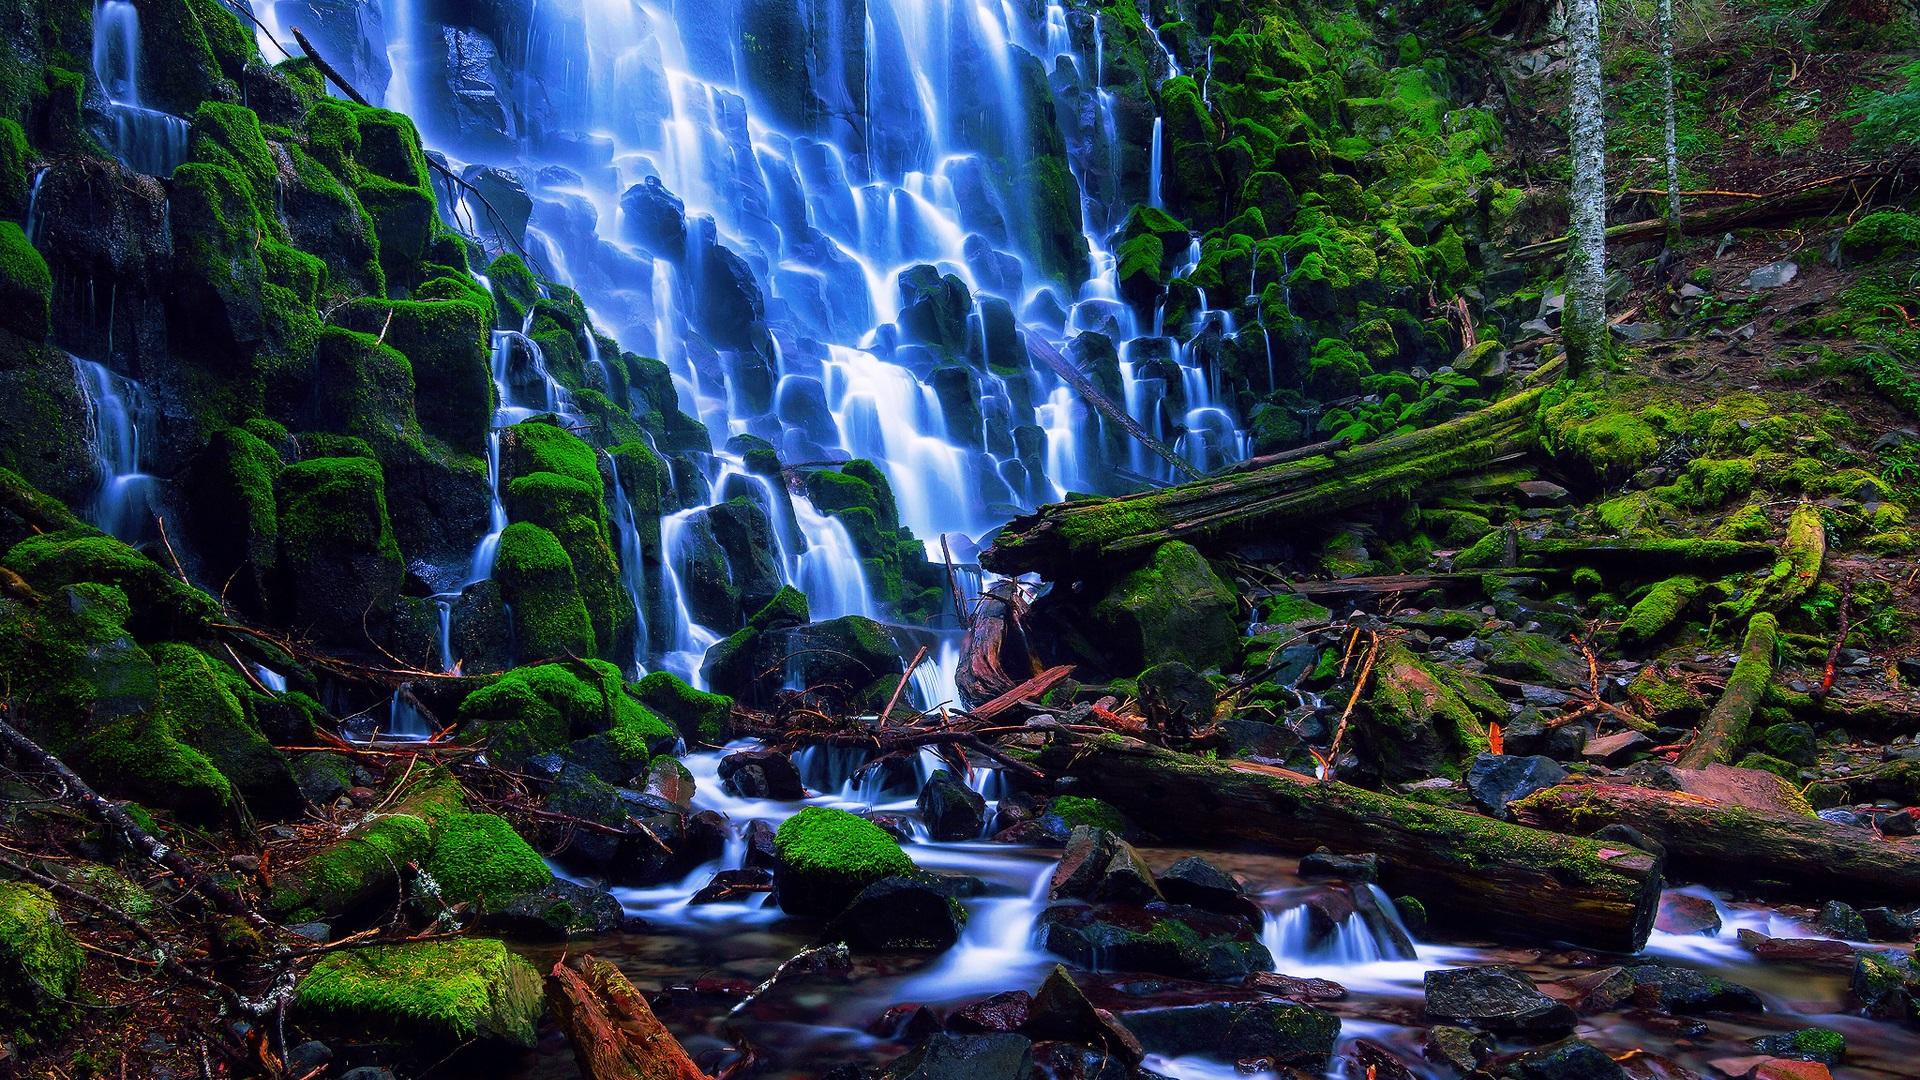 Wallpaper usa nature landscape oregon ramona falls - Oregon nature wallpaper ...